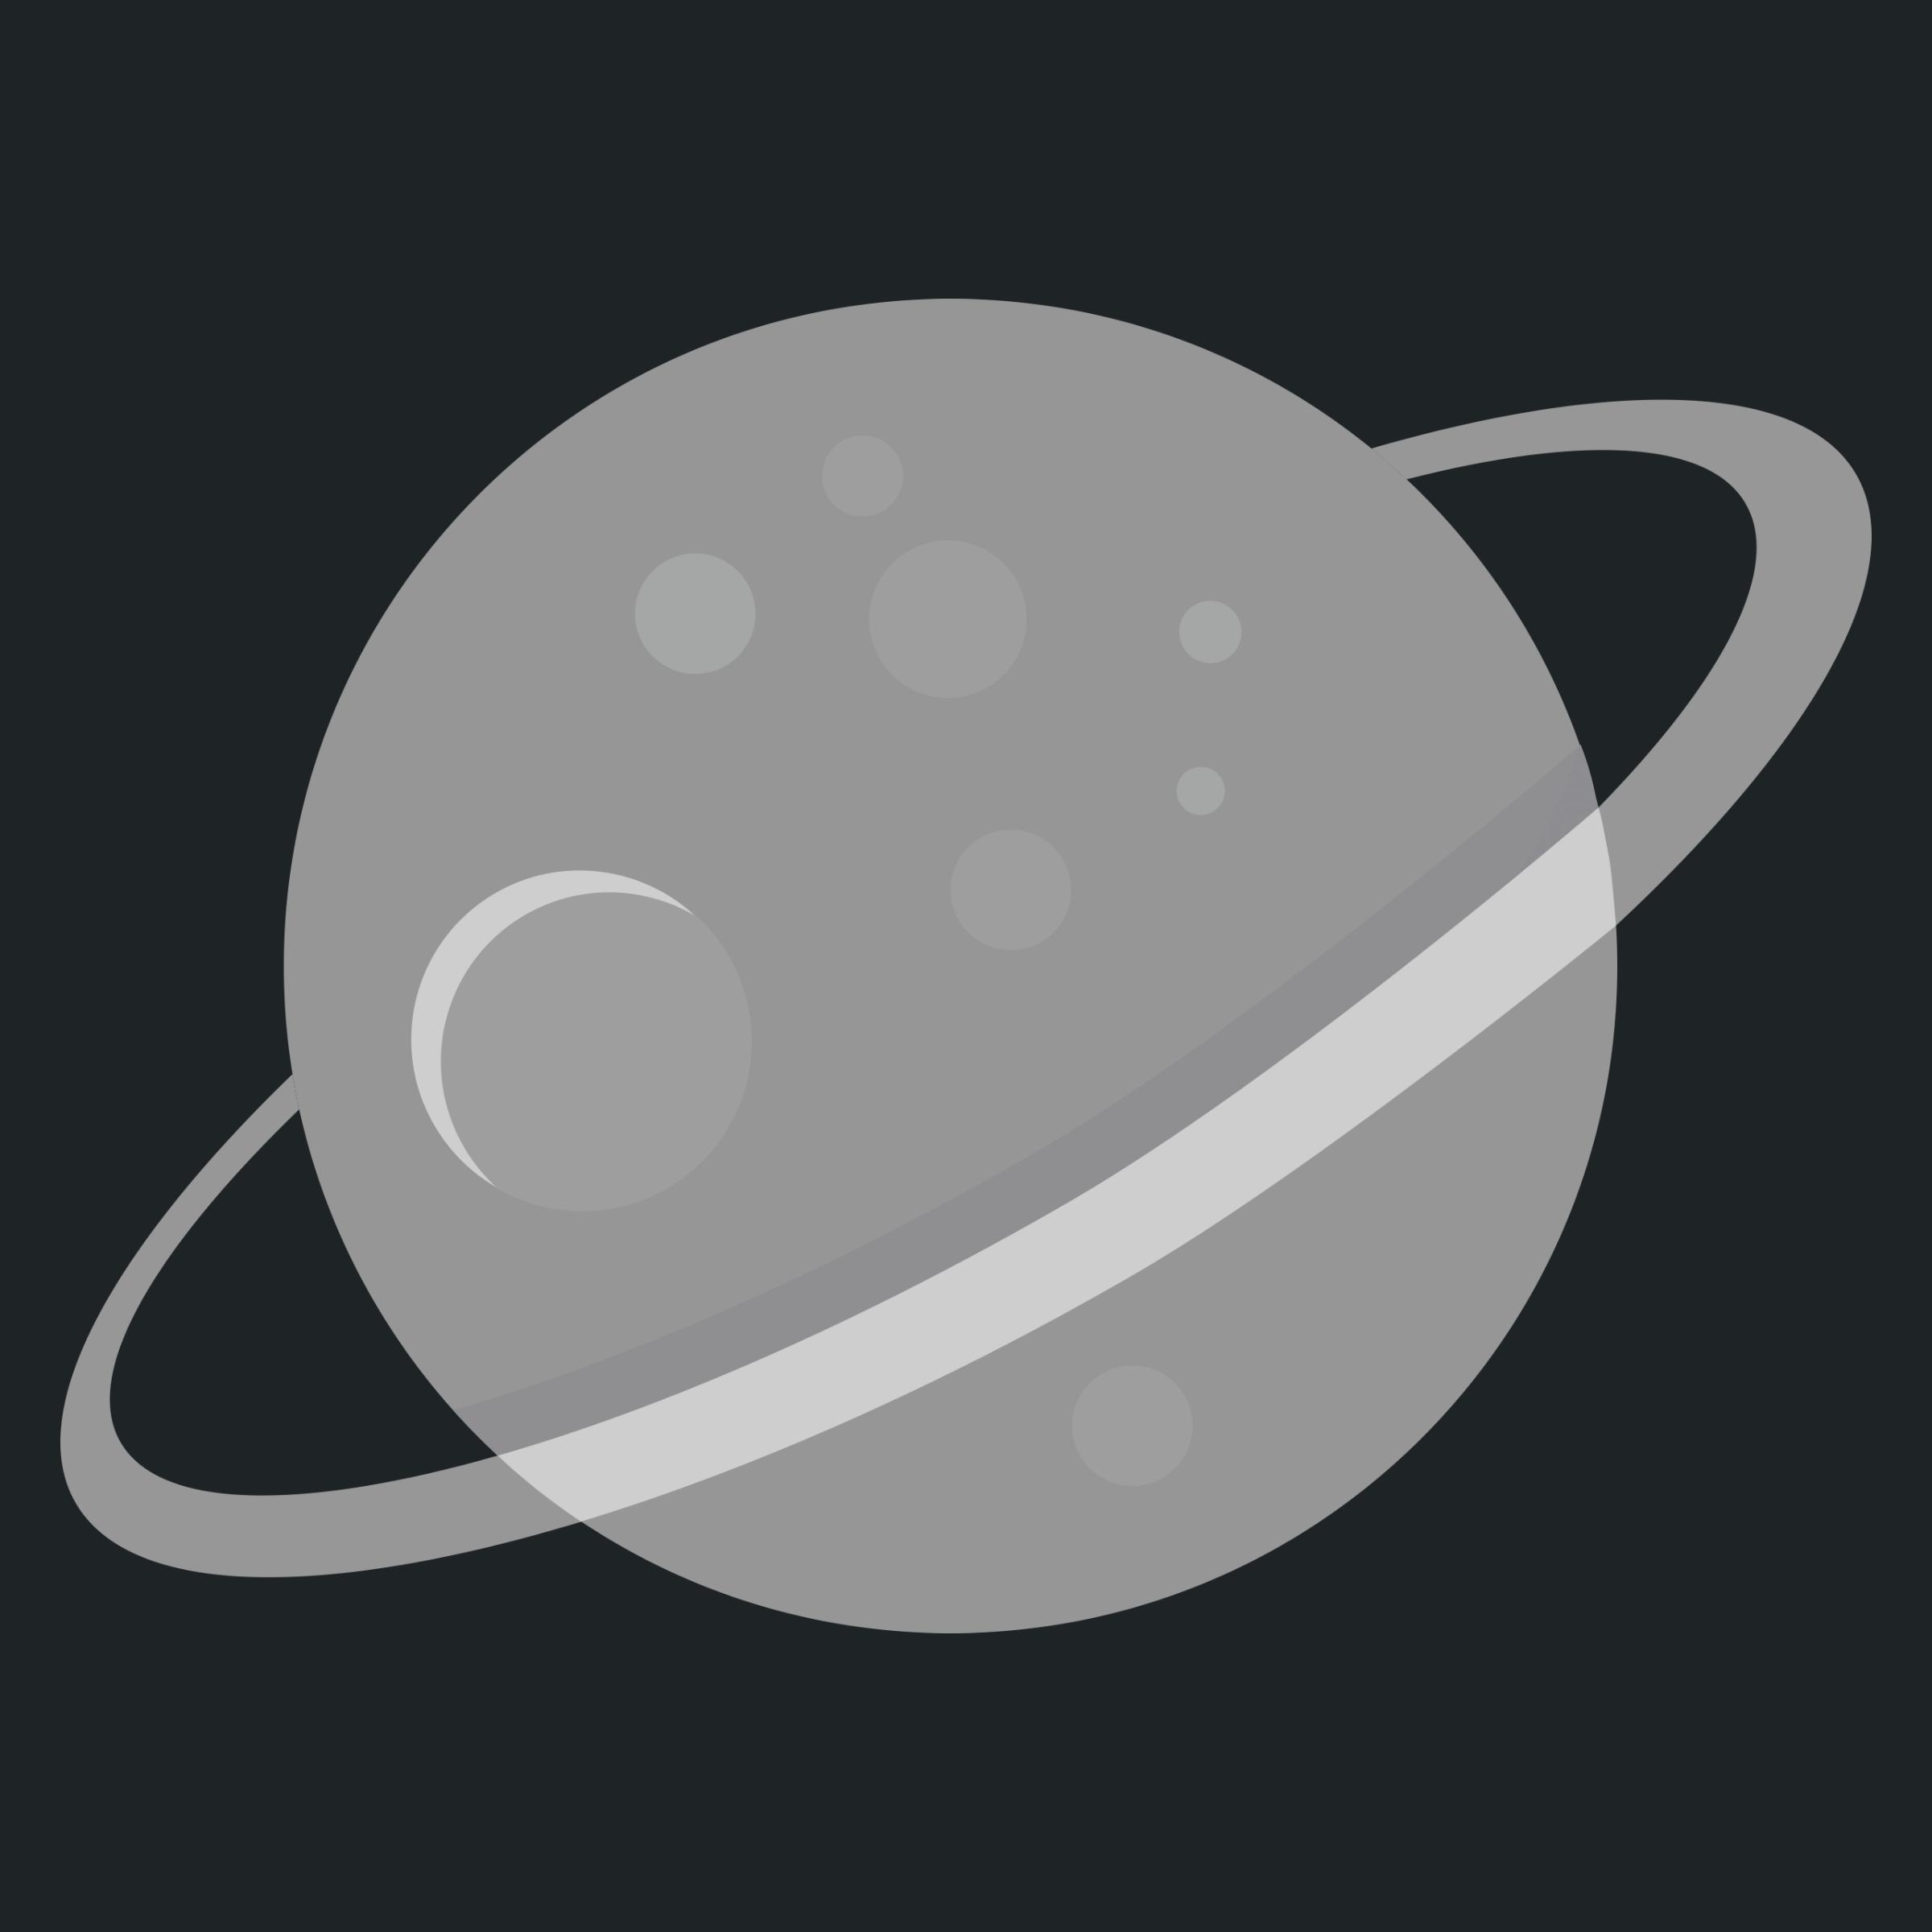 A Planet's Essence Detail